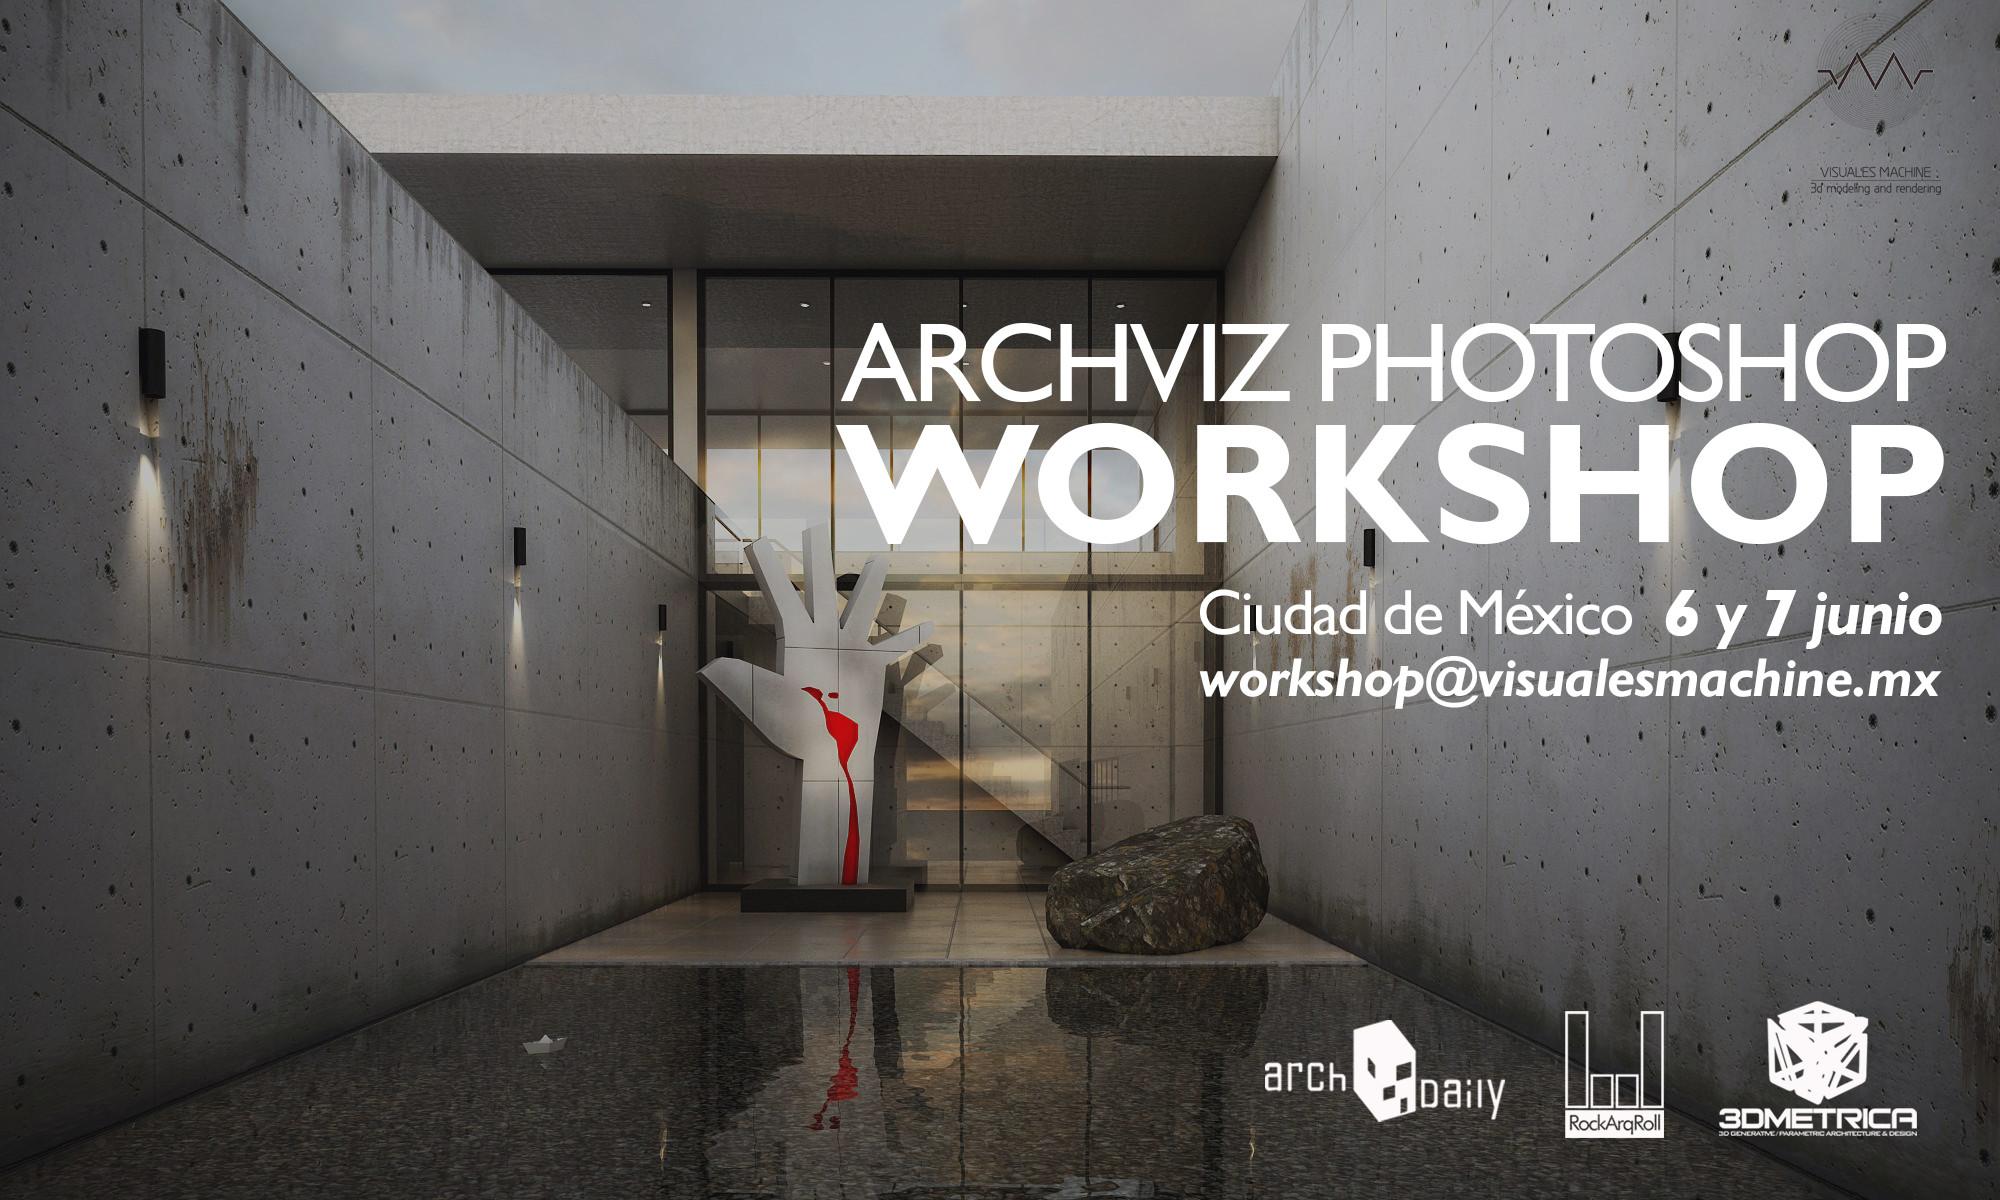 ArchViz Photoshop Workshop / Ciudad de México